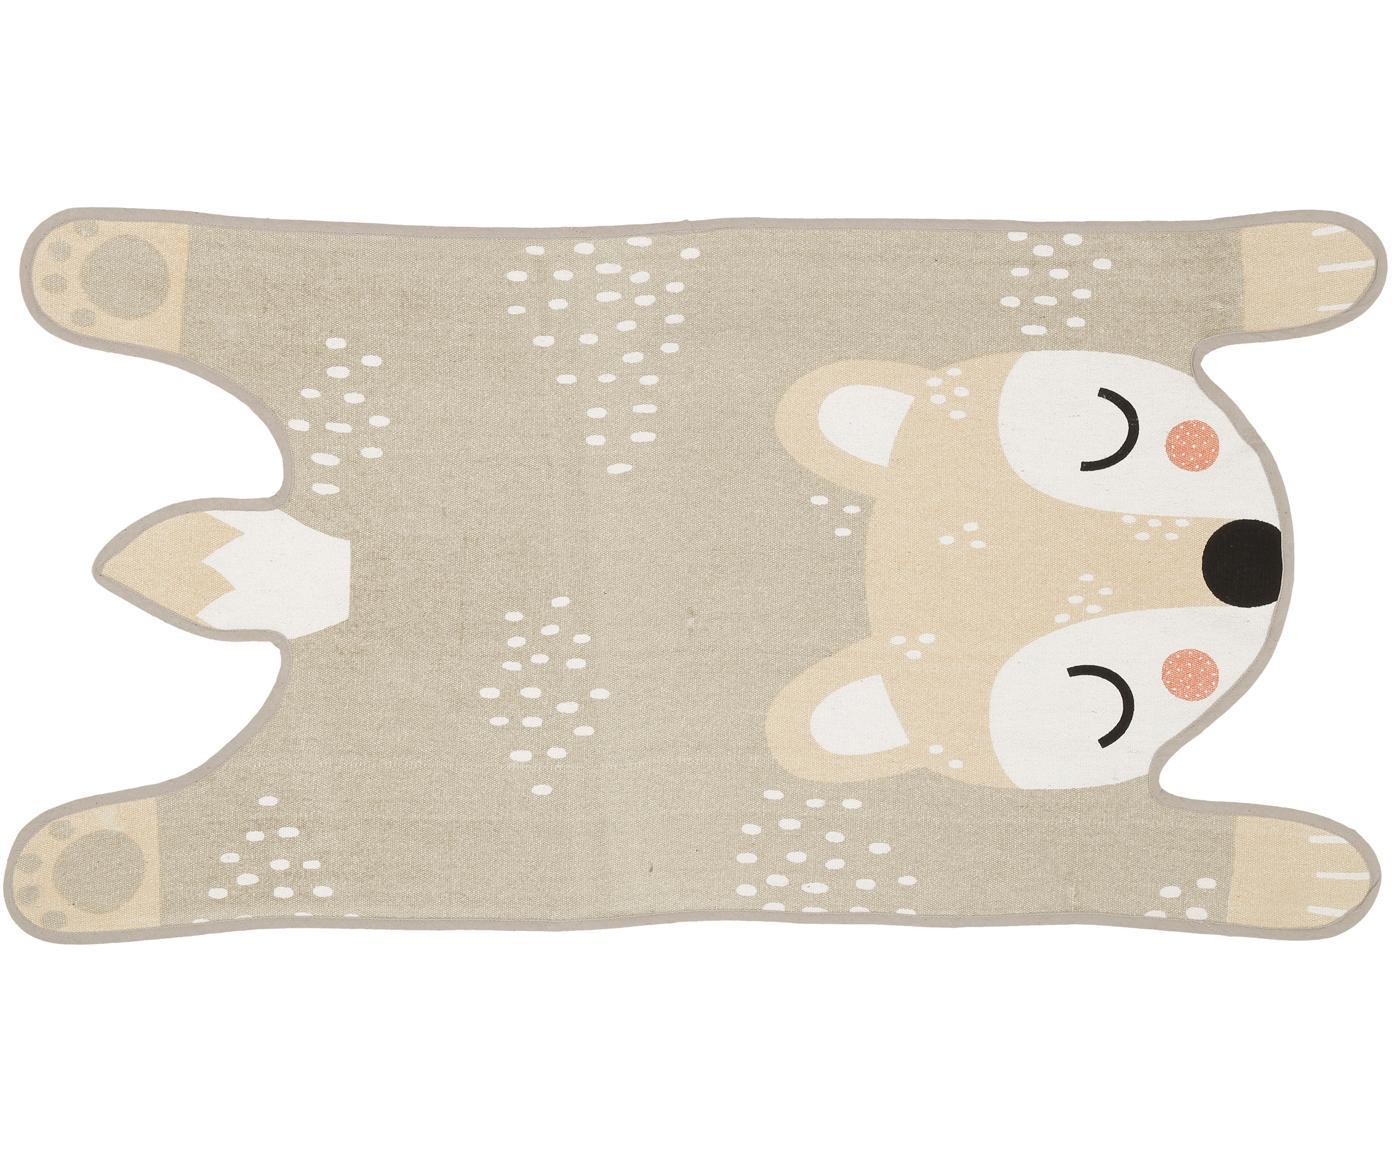 Flachgewebter Teppich Bear Bibi, Flor: Baumwolle, Beige, Creme, Schwarz, Rosa, 62 x 120 cm